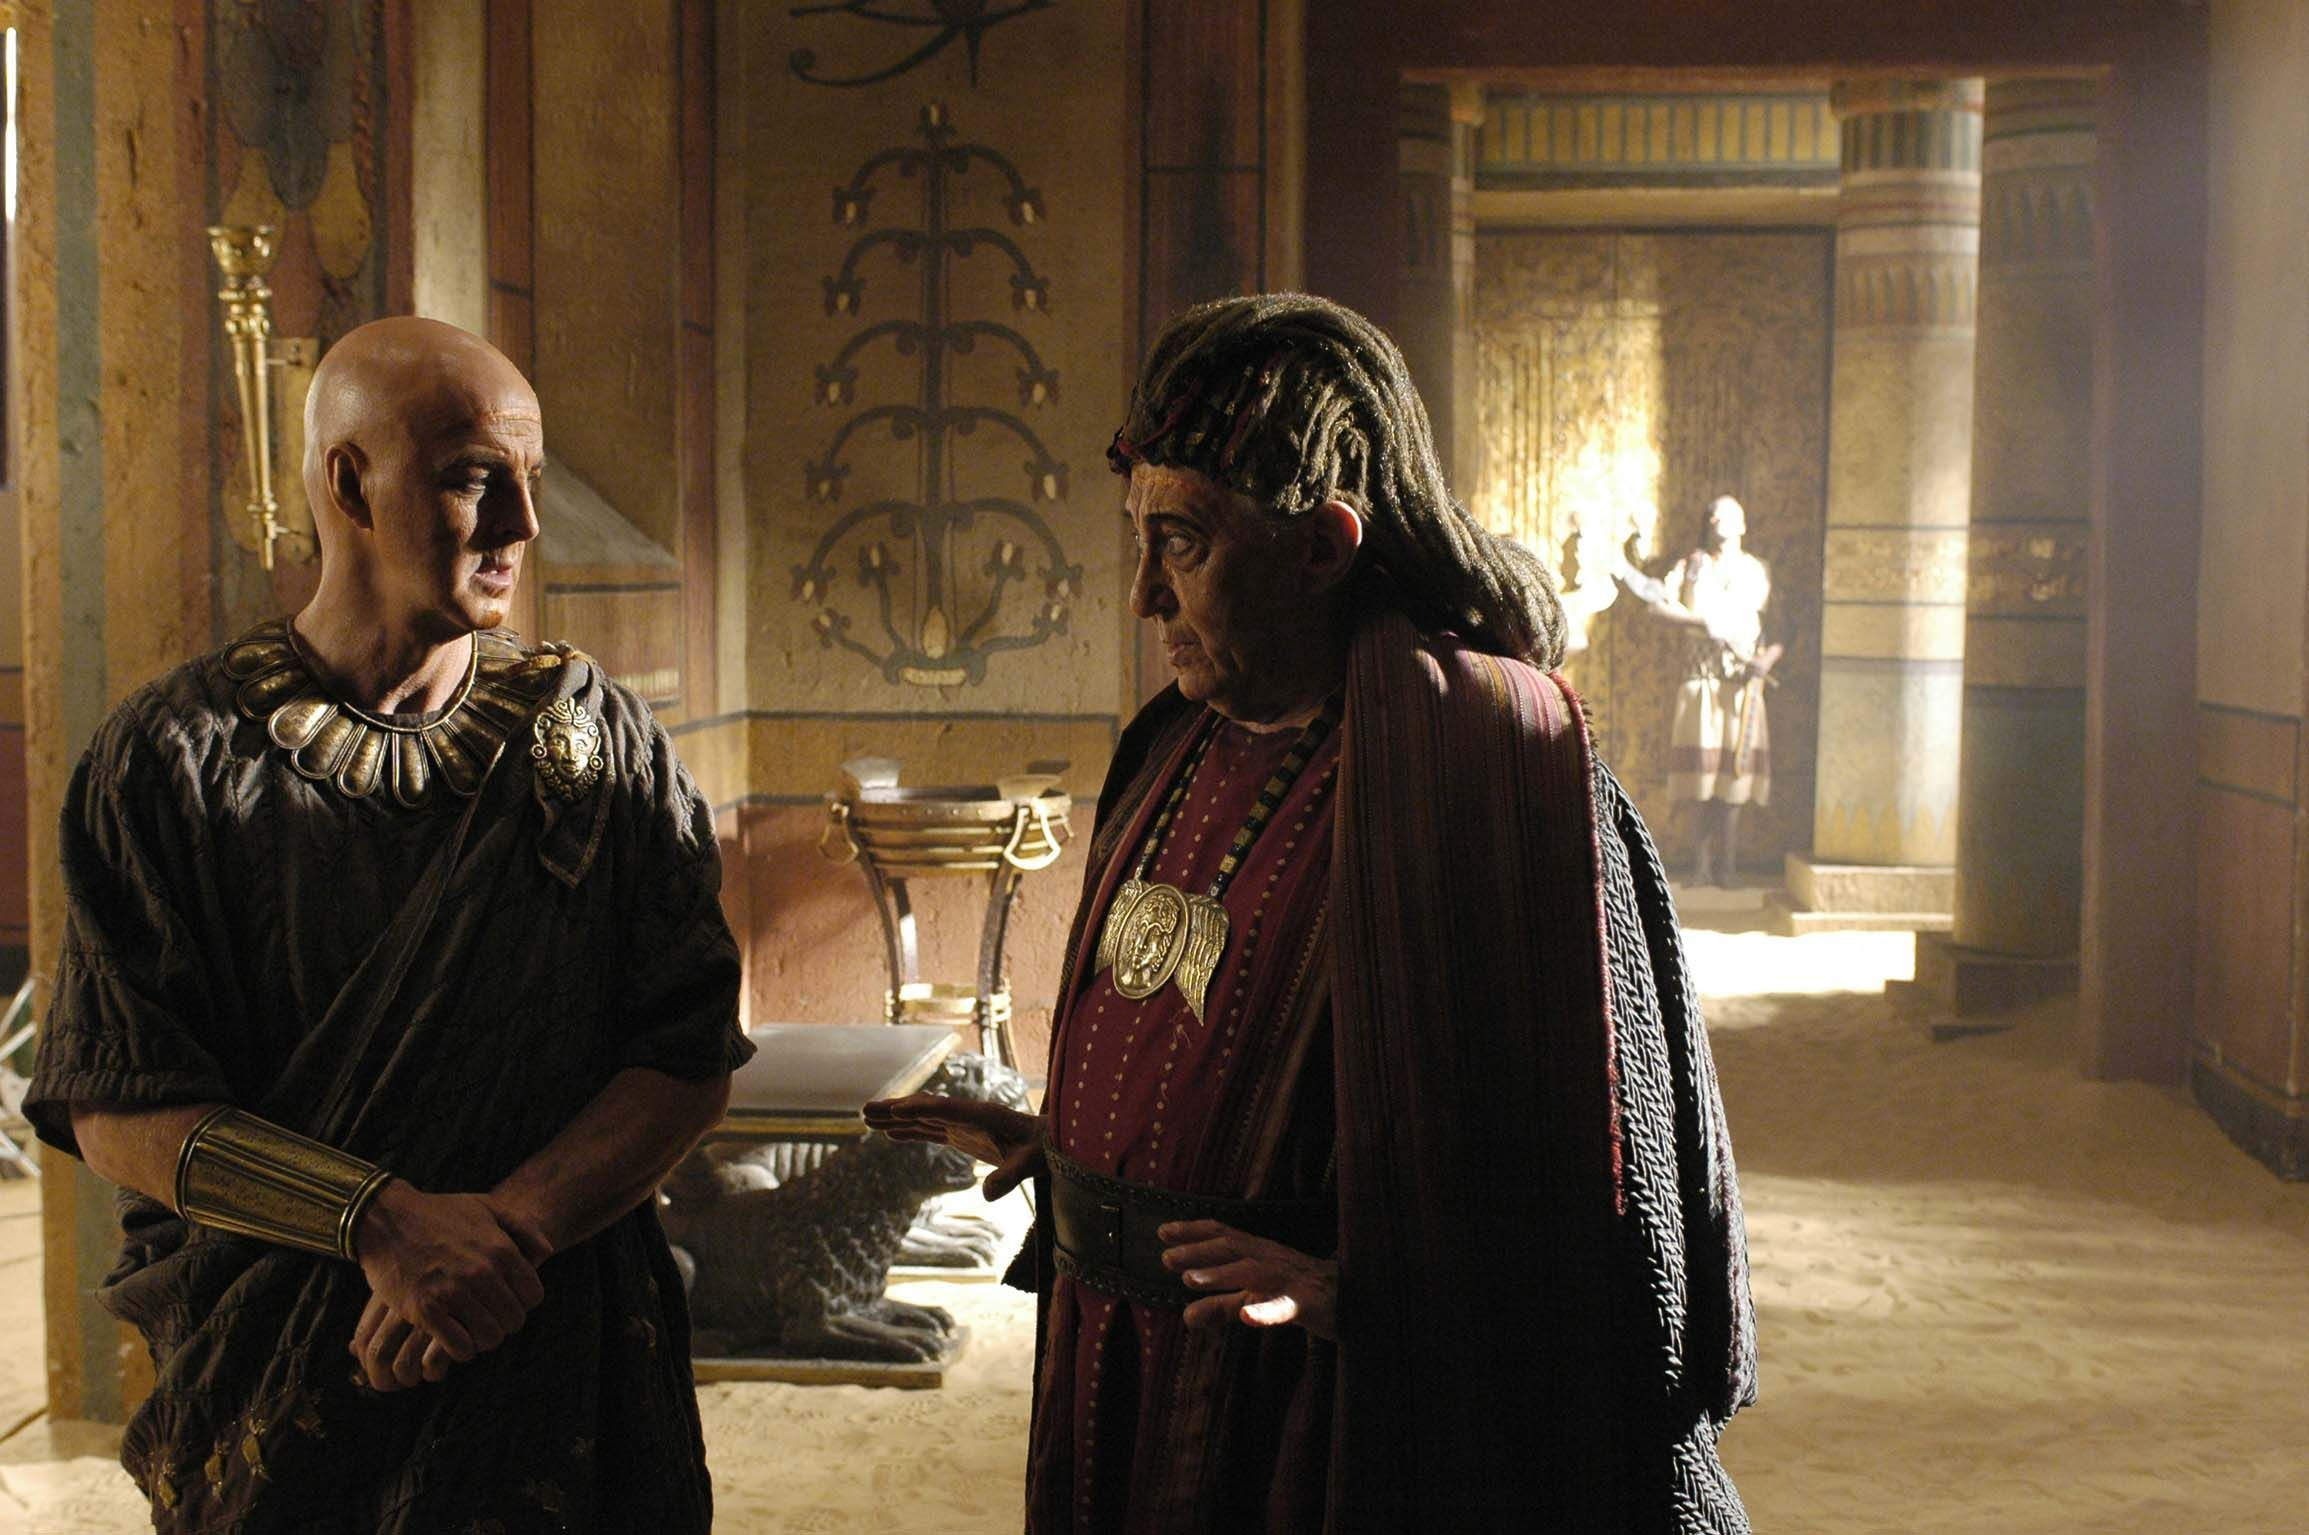 Rome TV Series - Season 1 Episode 8 Still | Rome hbo, Hbo ...